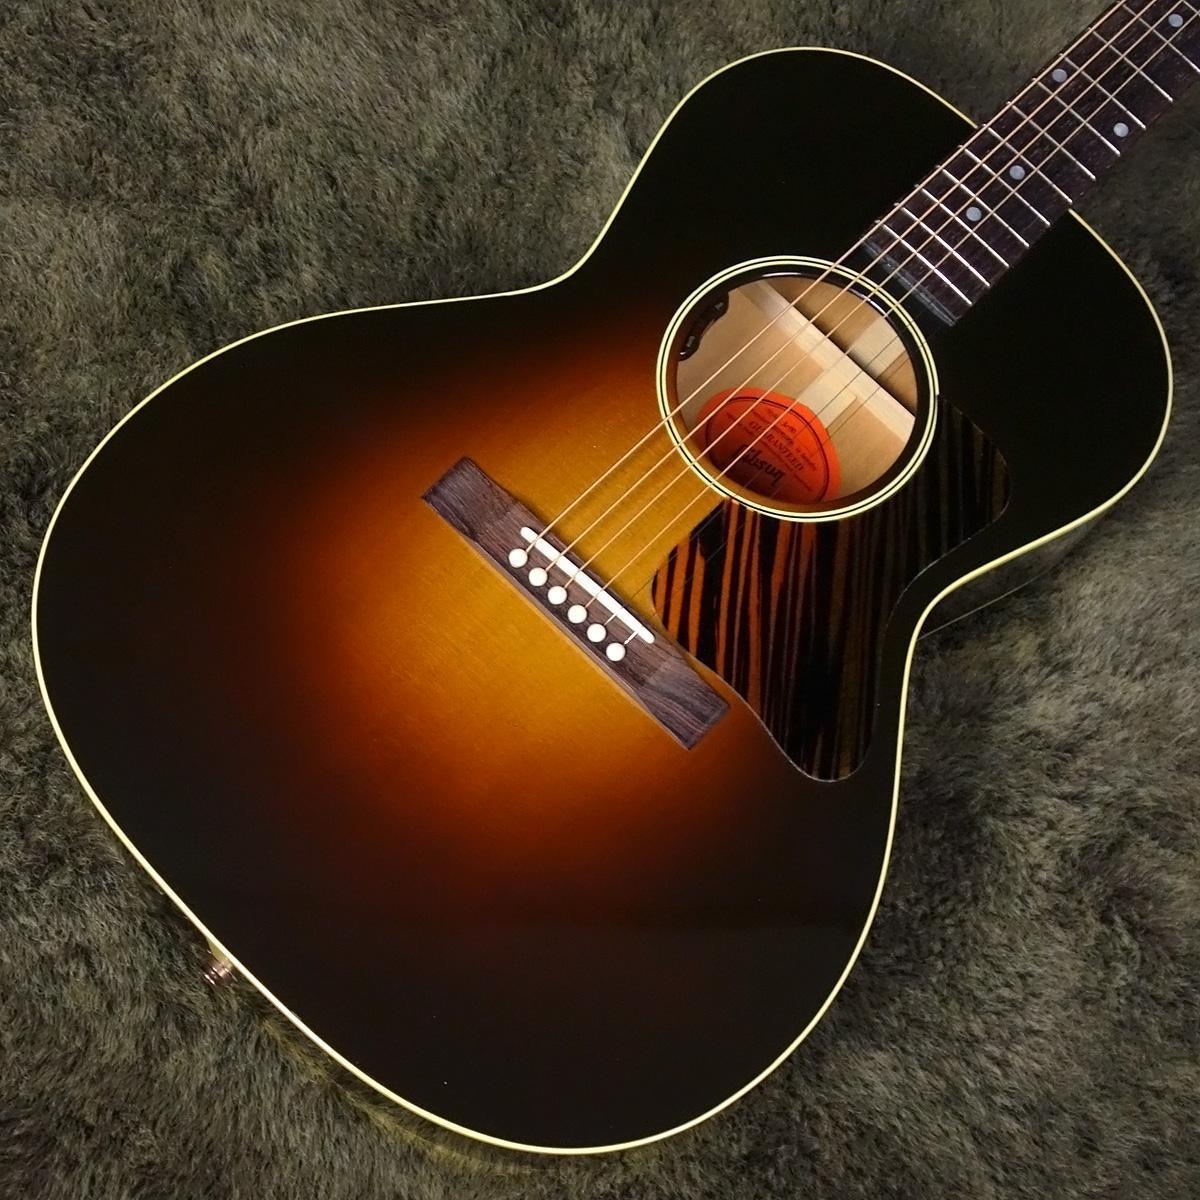 新品「 Gibson 【 L-00 Original Vintage Sunburst 】」_画像1